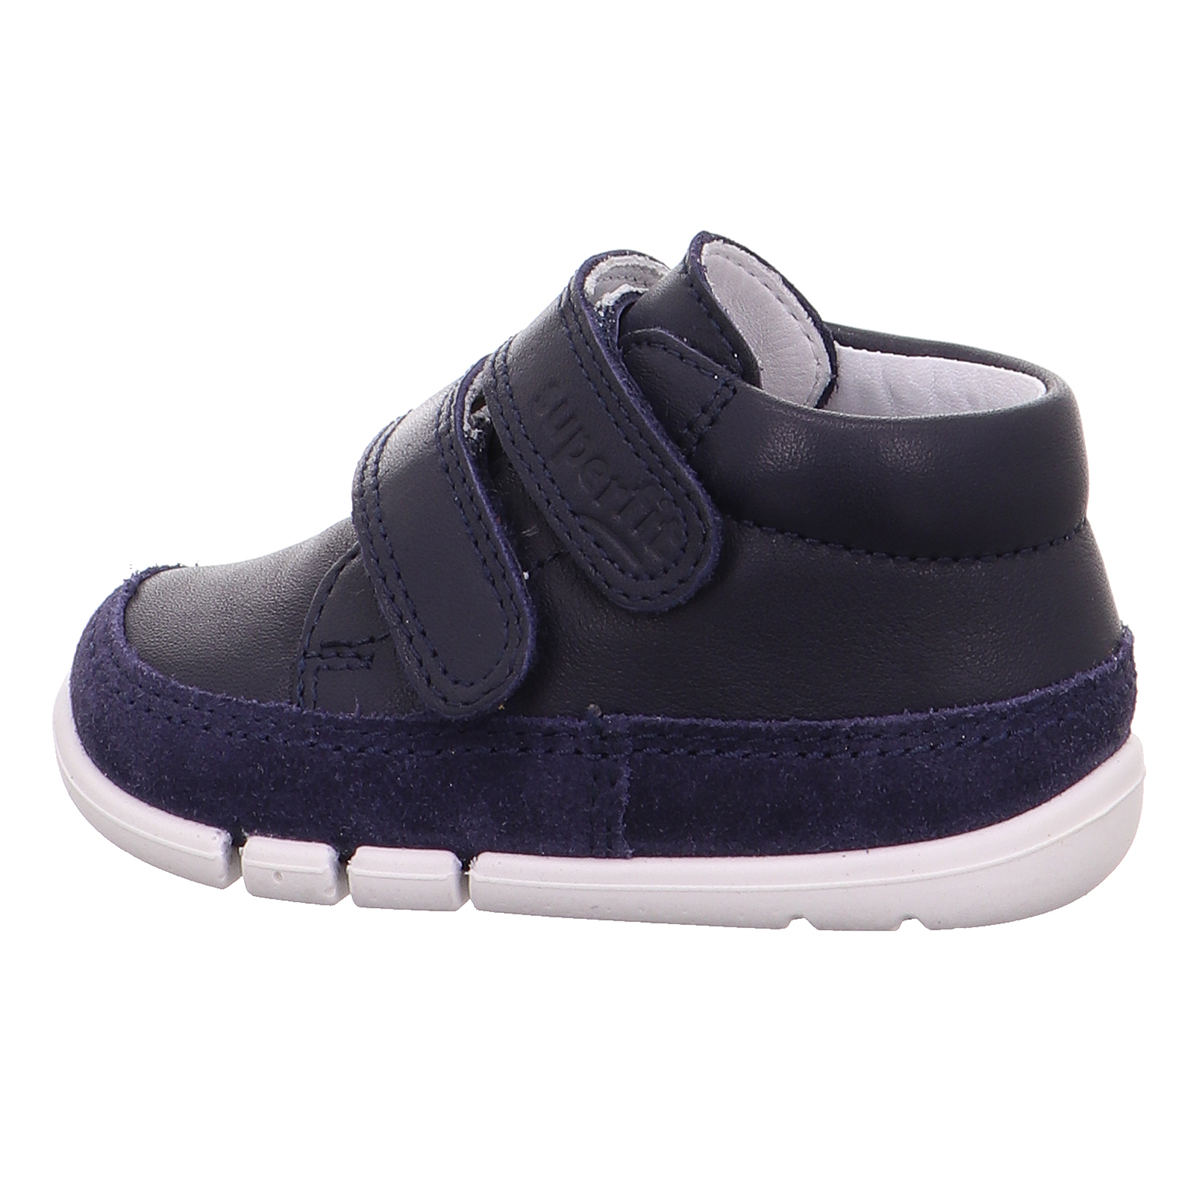 Купить Пинетки-ботинки Superfit Sport Blue, р. 23 1-006341-8000 ТМ: Superfit, синий